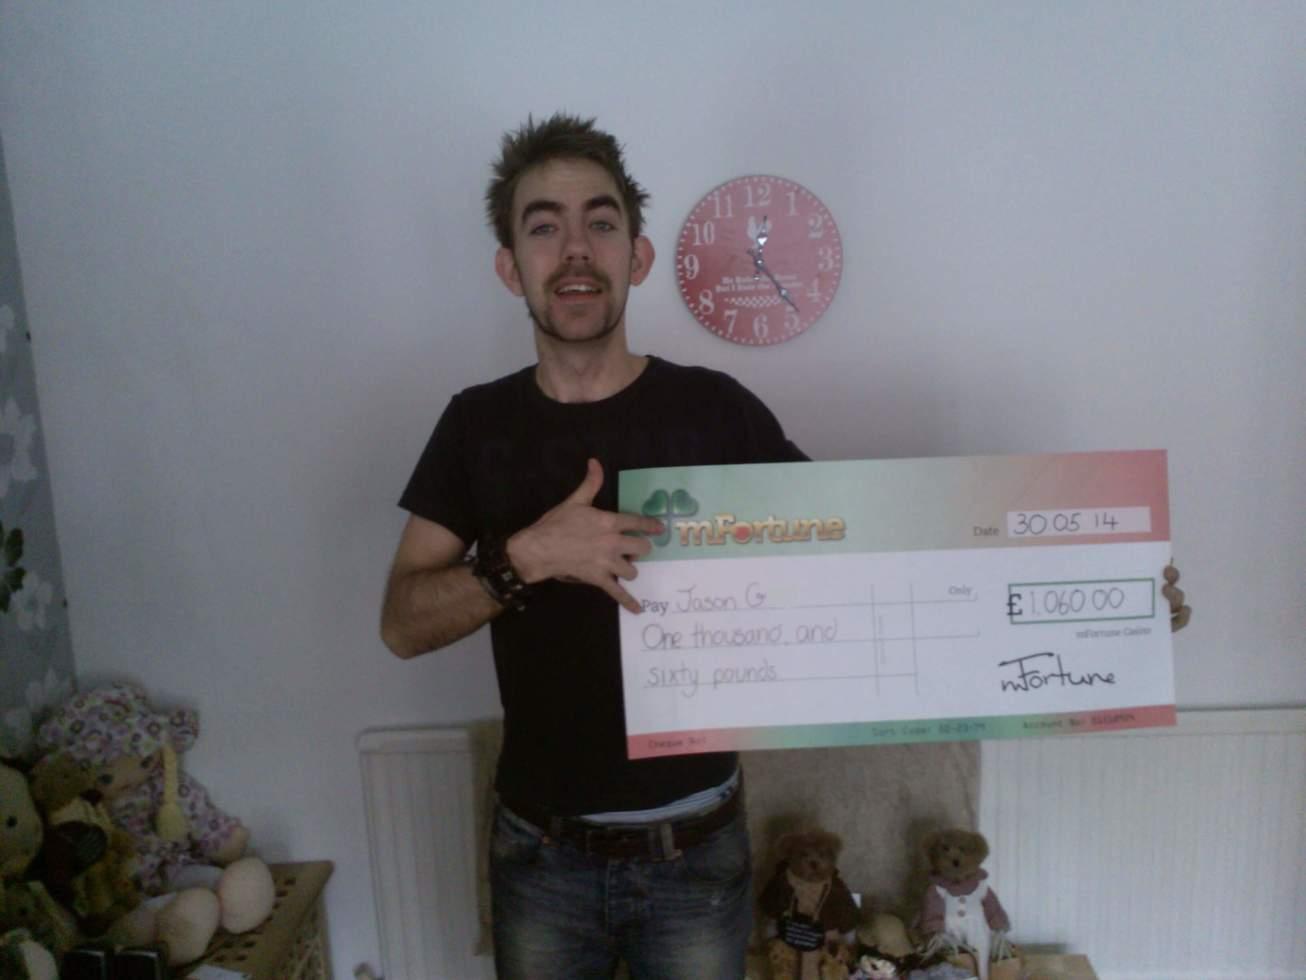 Jason G won £ 1,060